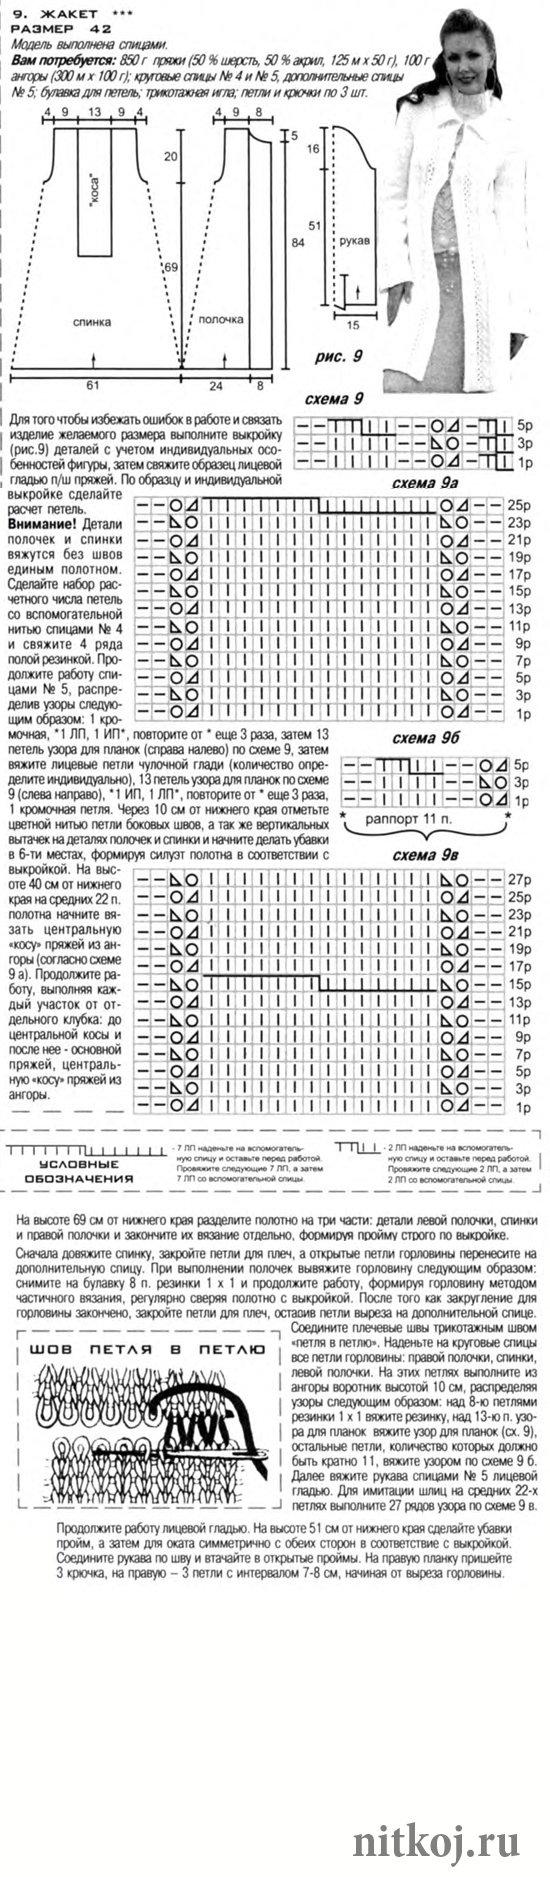 Кардиган спицами схема описание вязания 51